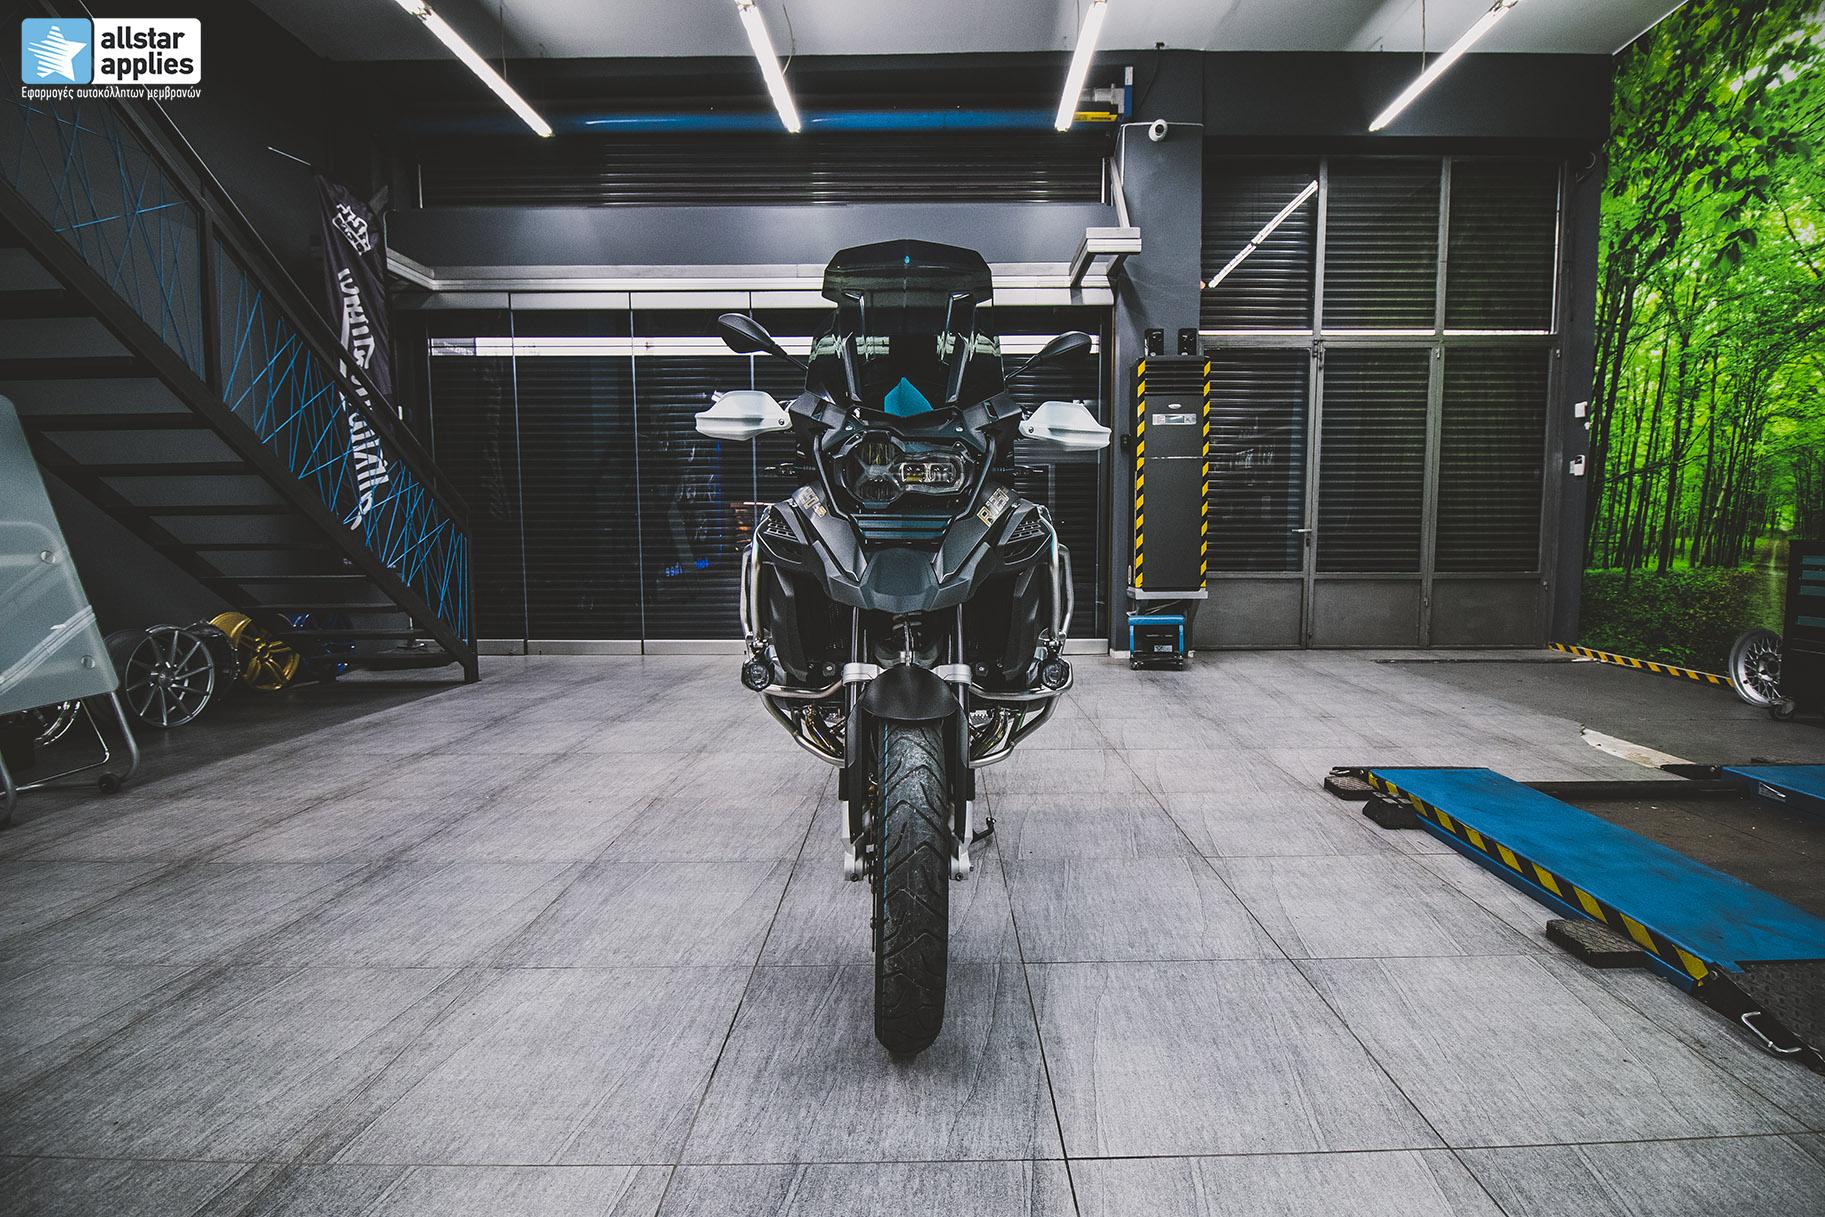 BMW R 1250 GS moto wrapping Greece Allstar Applies Thessaloniki